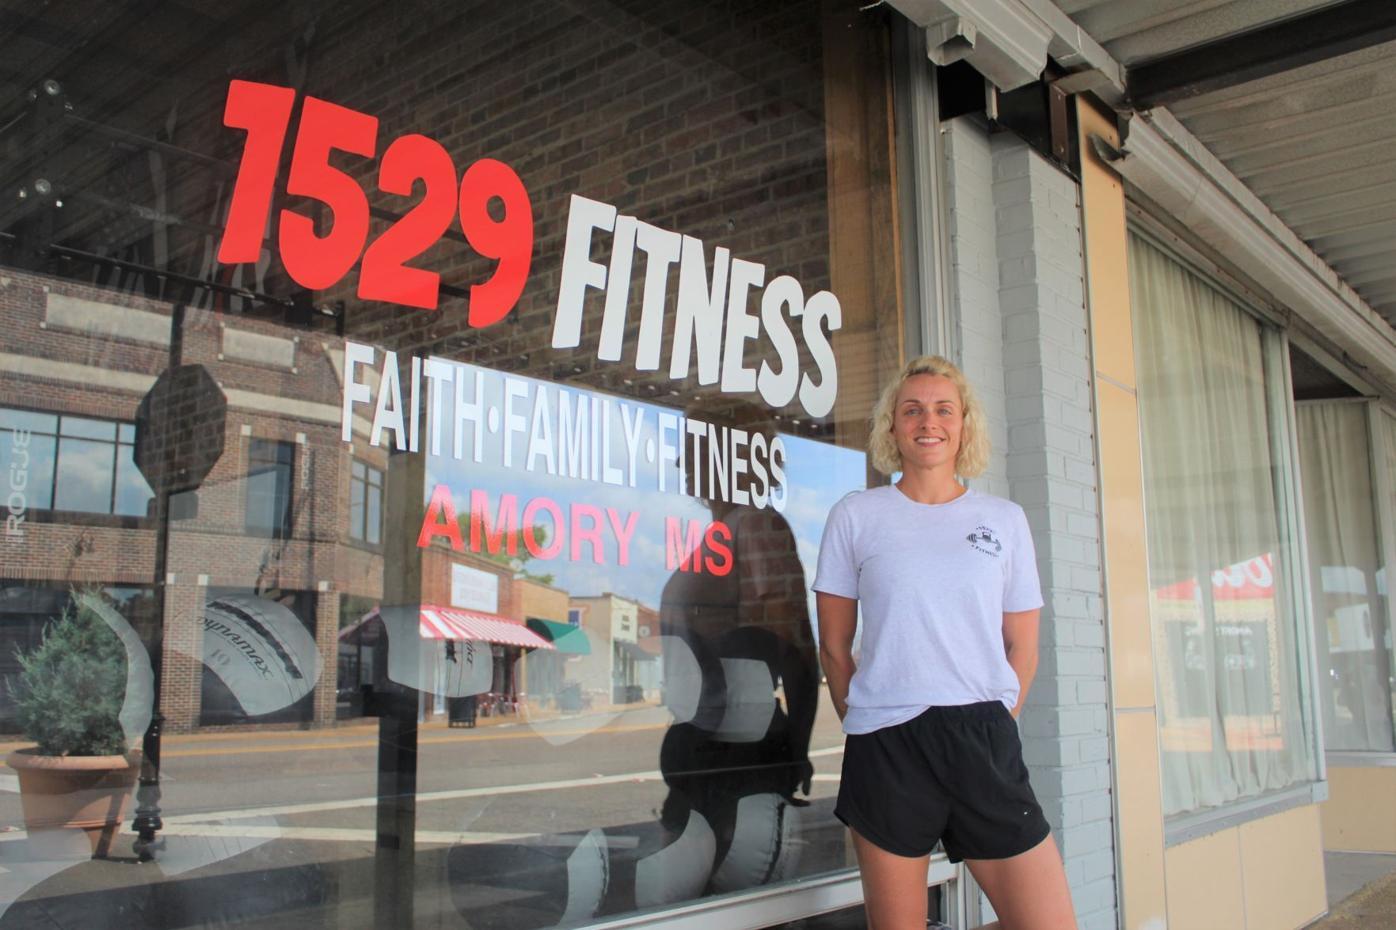 mcj-2021-07-14-news-1529-fitness-secondary